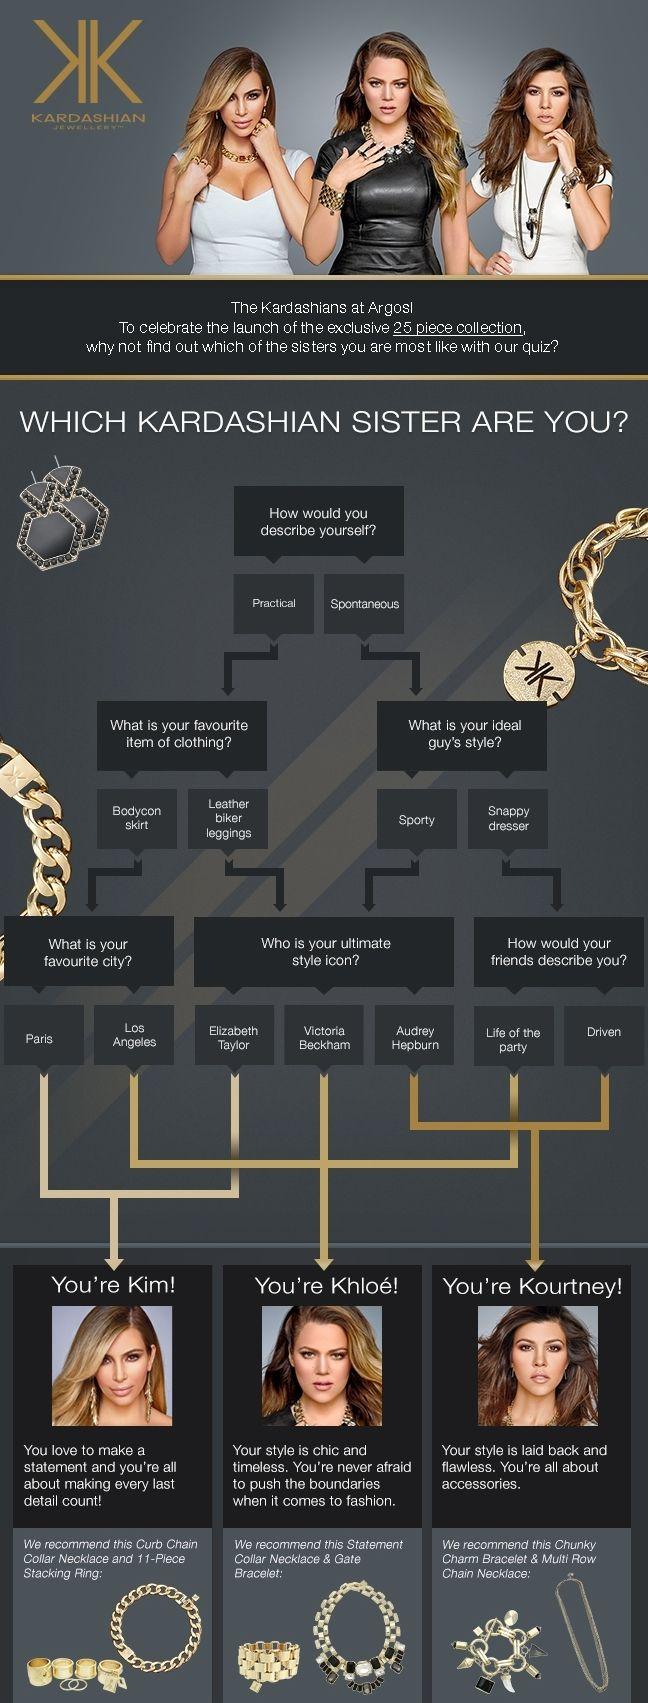 59 Best Uk Jewellery Images On Pinterest Kardashian Kollection Jewelery And Jewellery